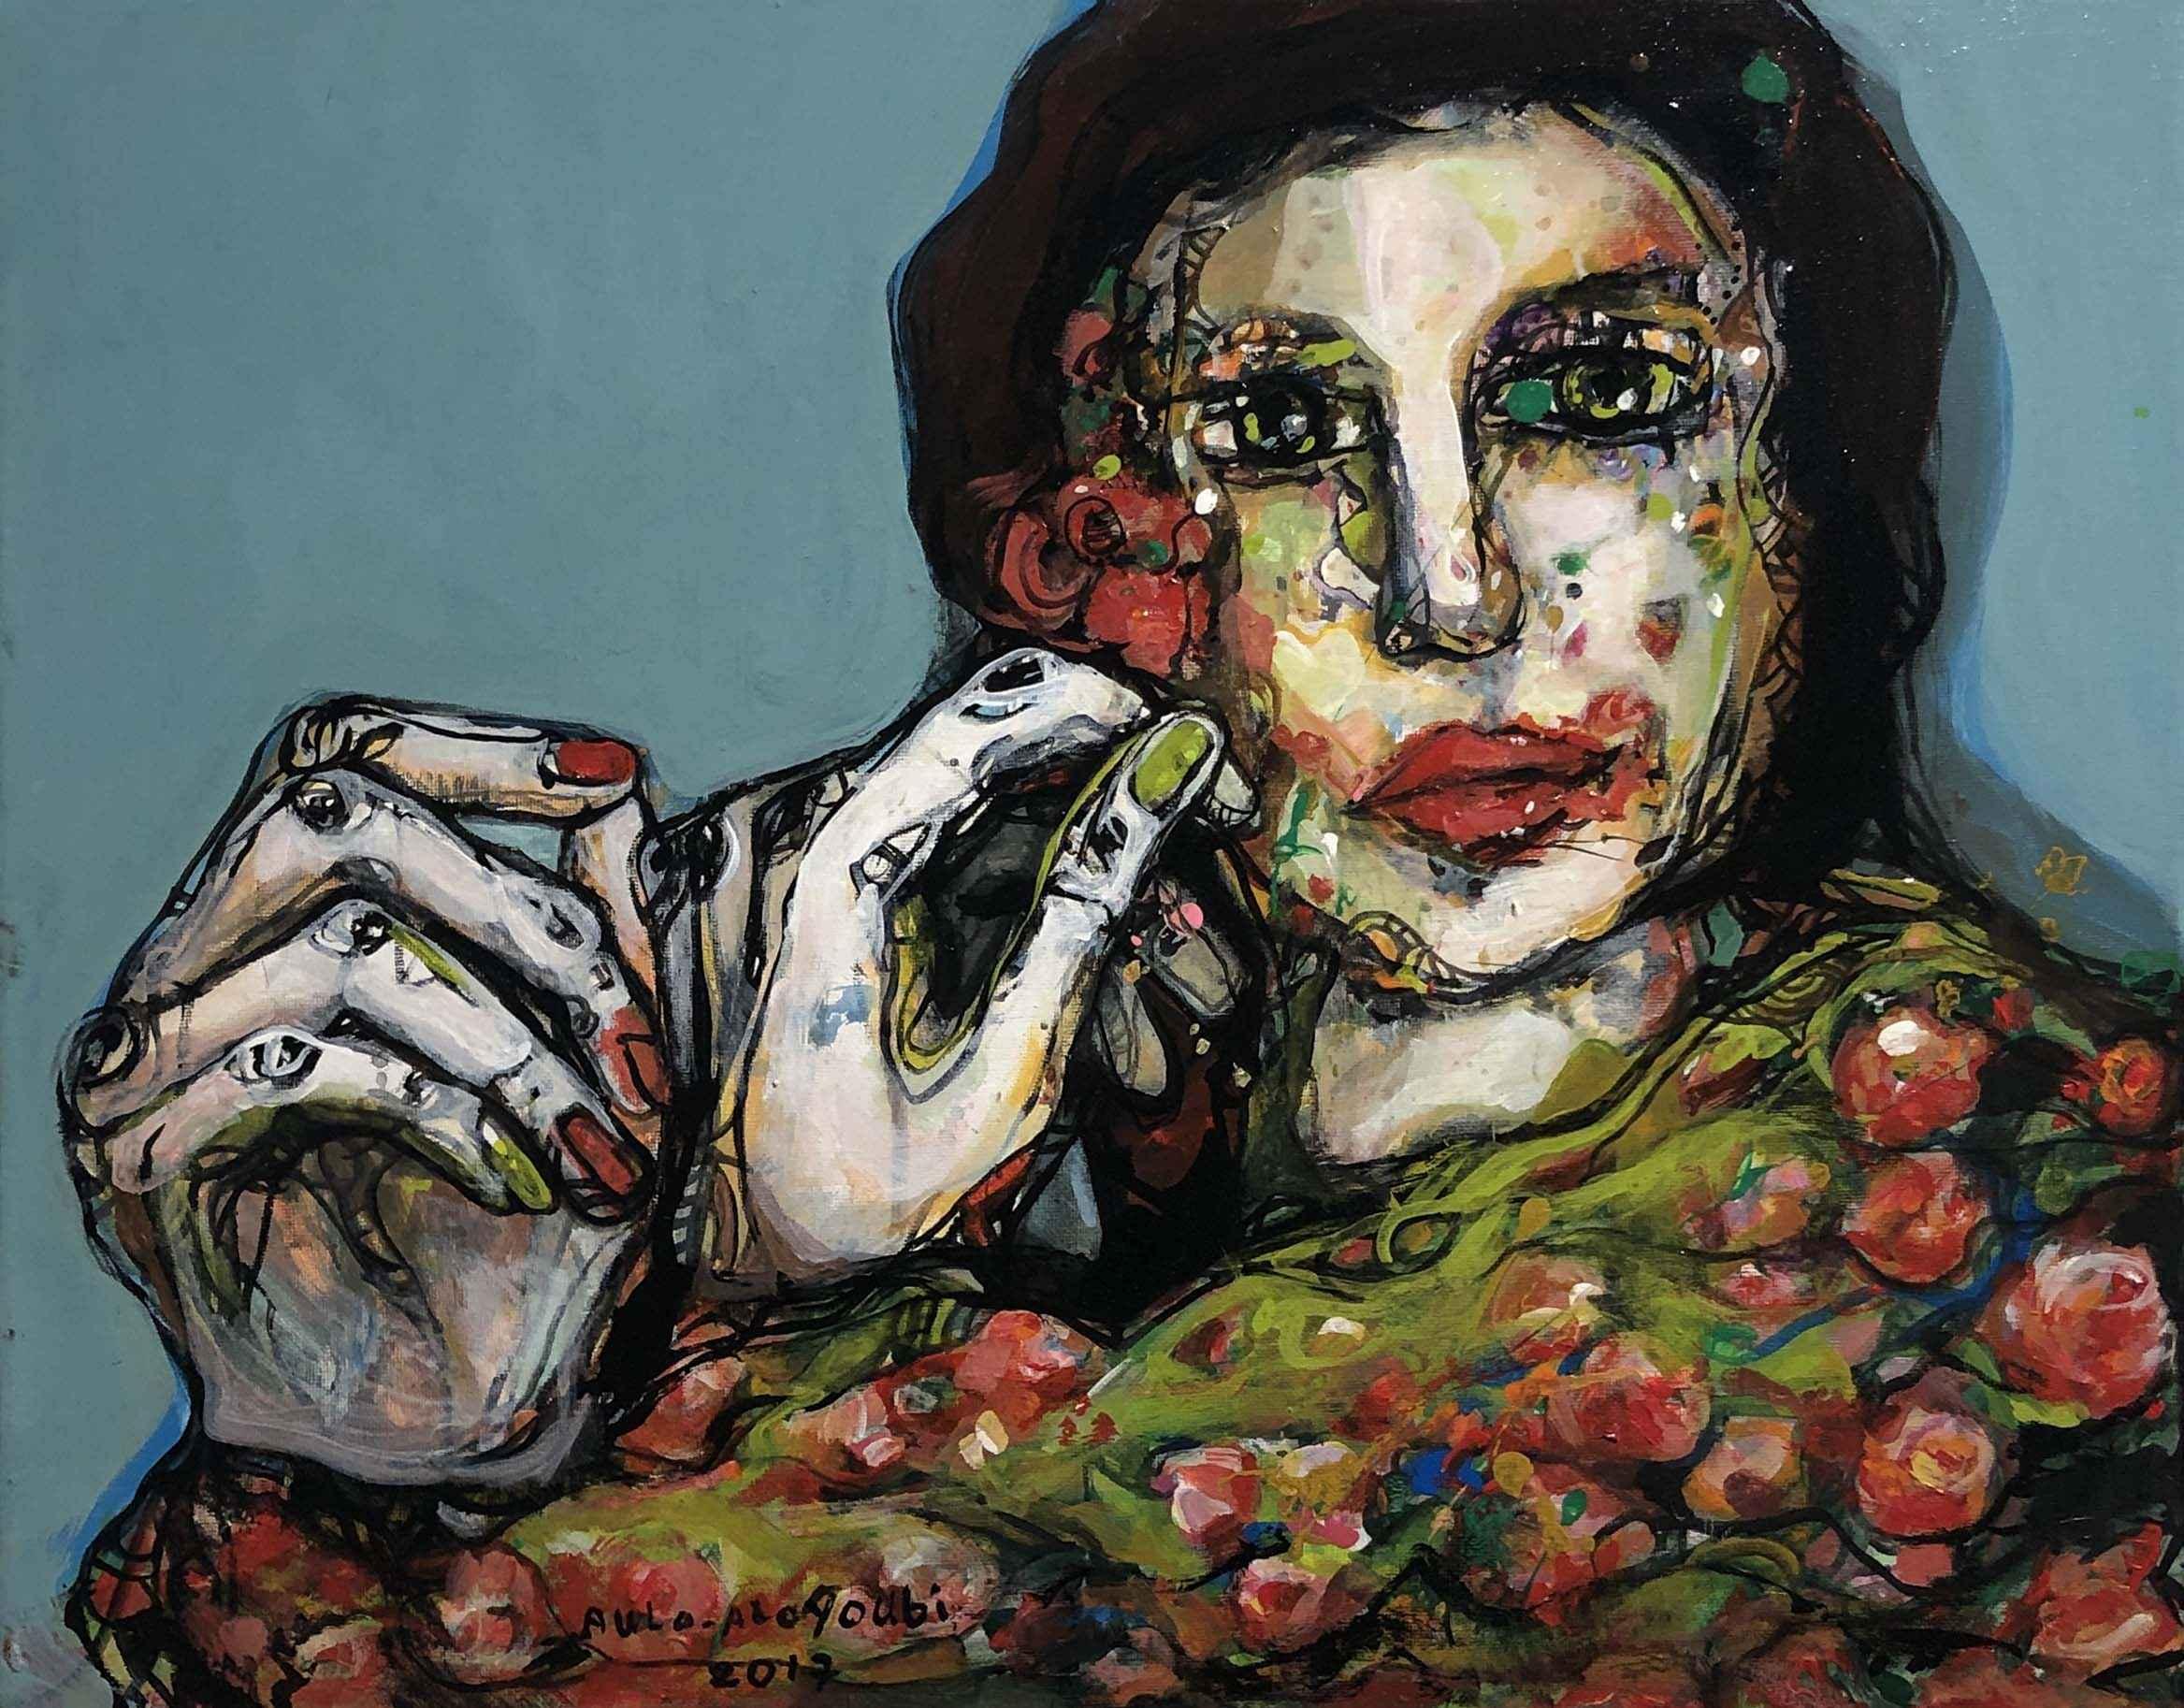 Bound Dancer #2 by  Aula Alayoubi - Masterpiece Online